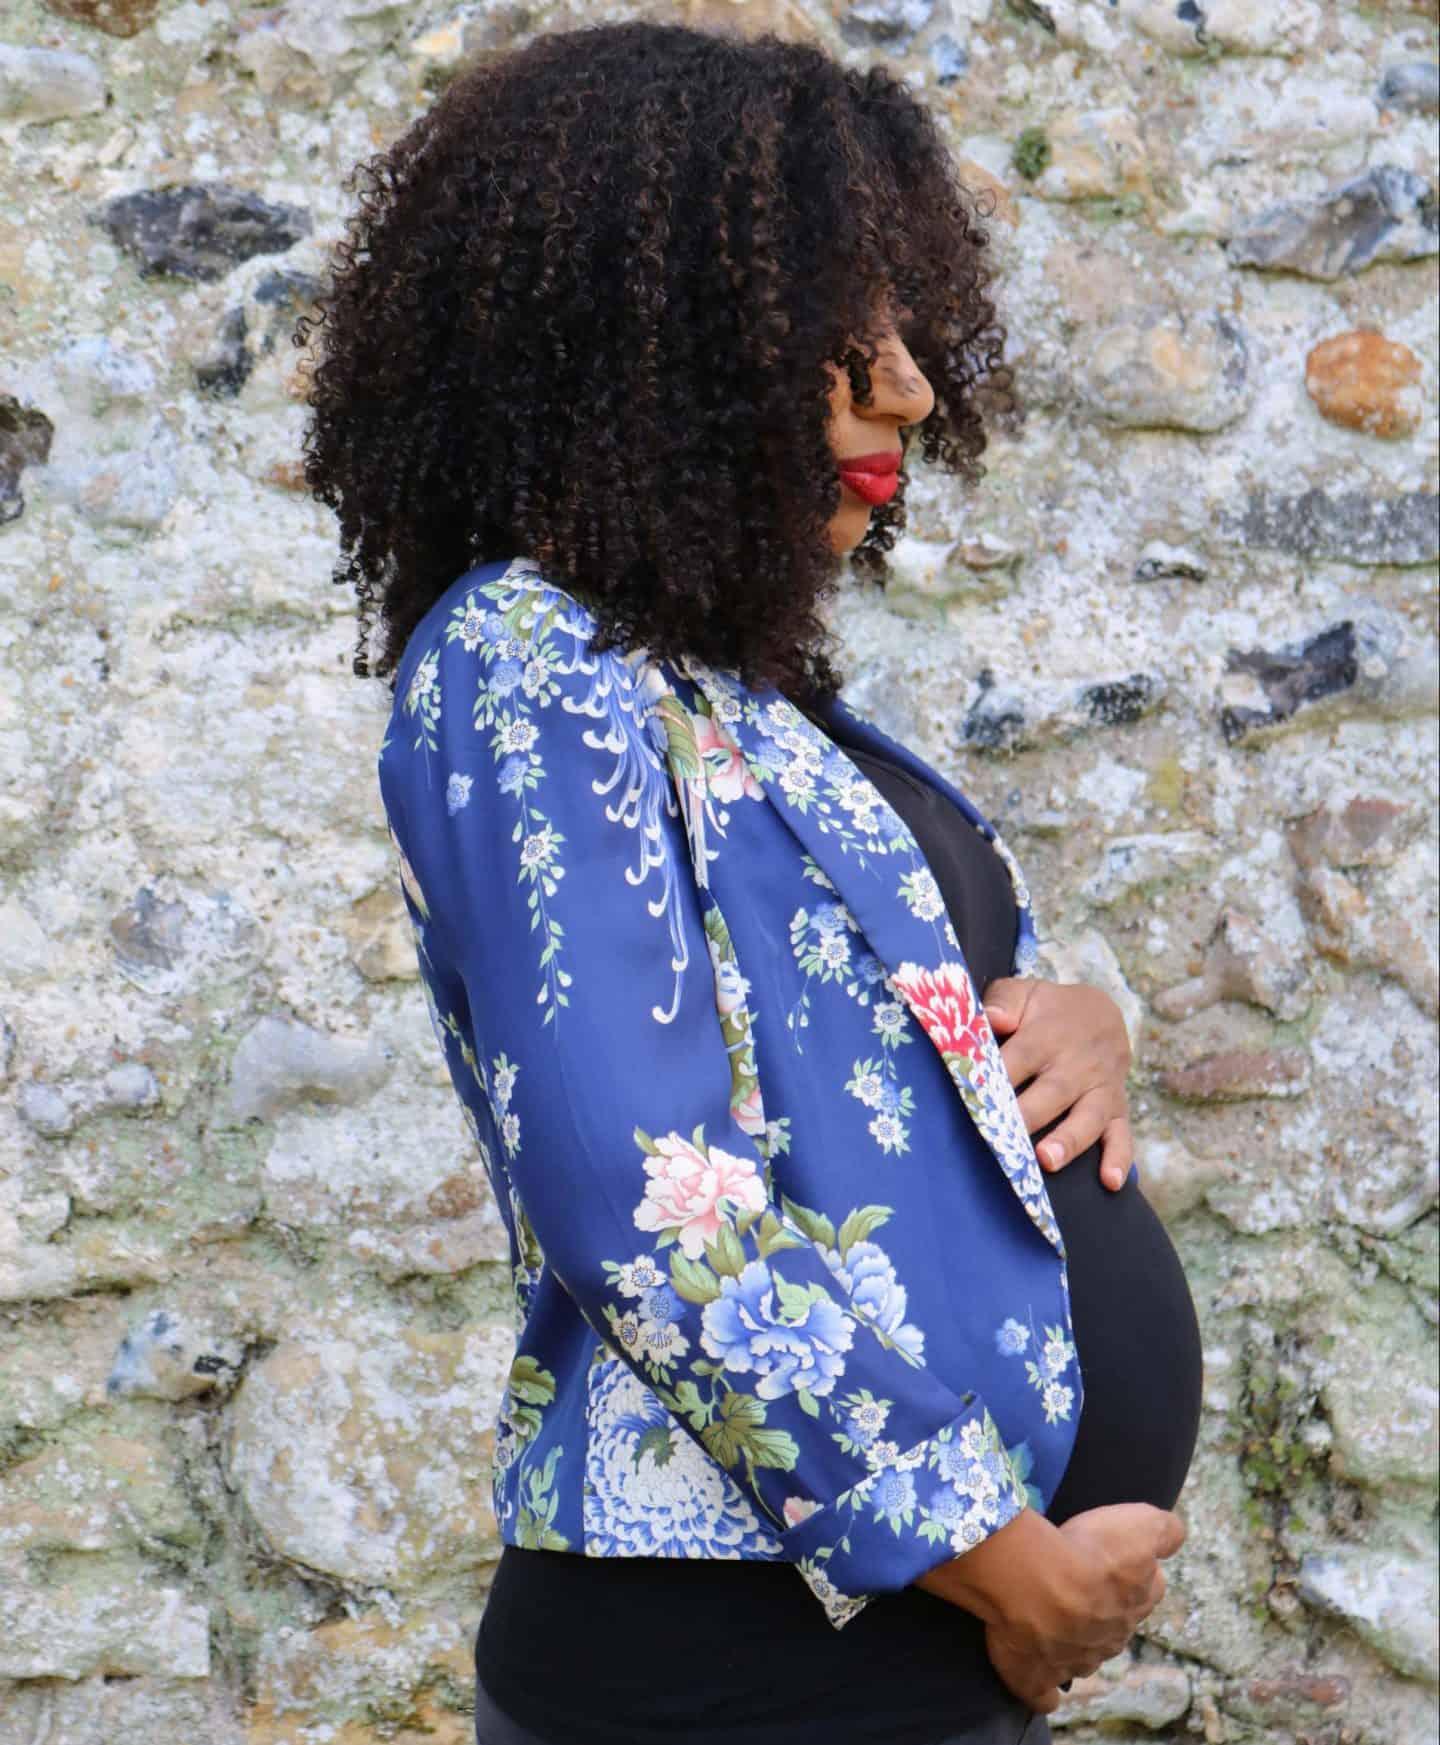 eleanor j'adore - Pregnancy Update